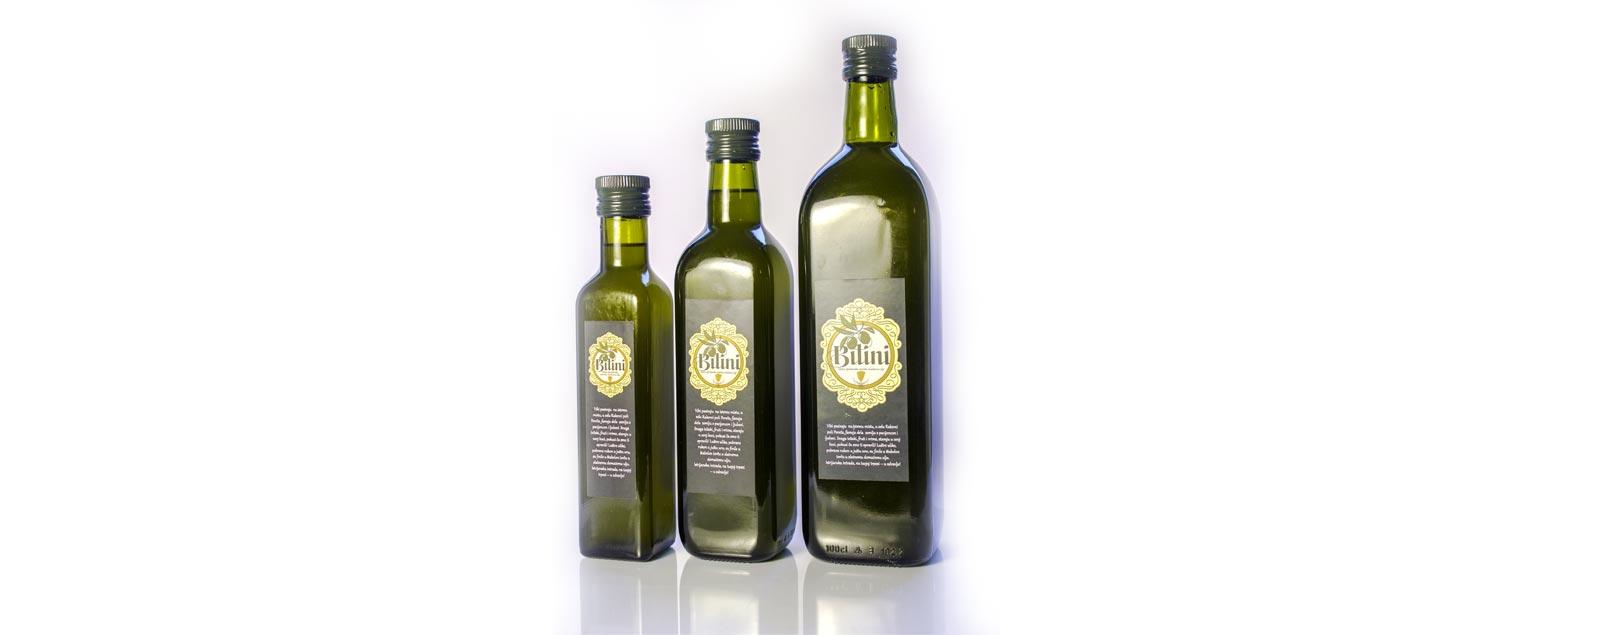 extra virgin olive oil Bilini